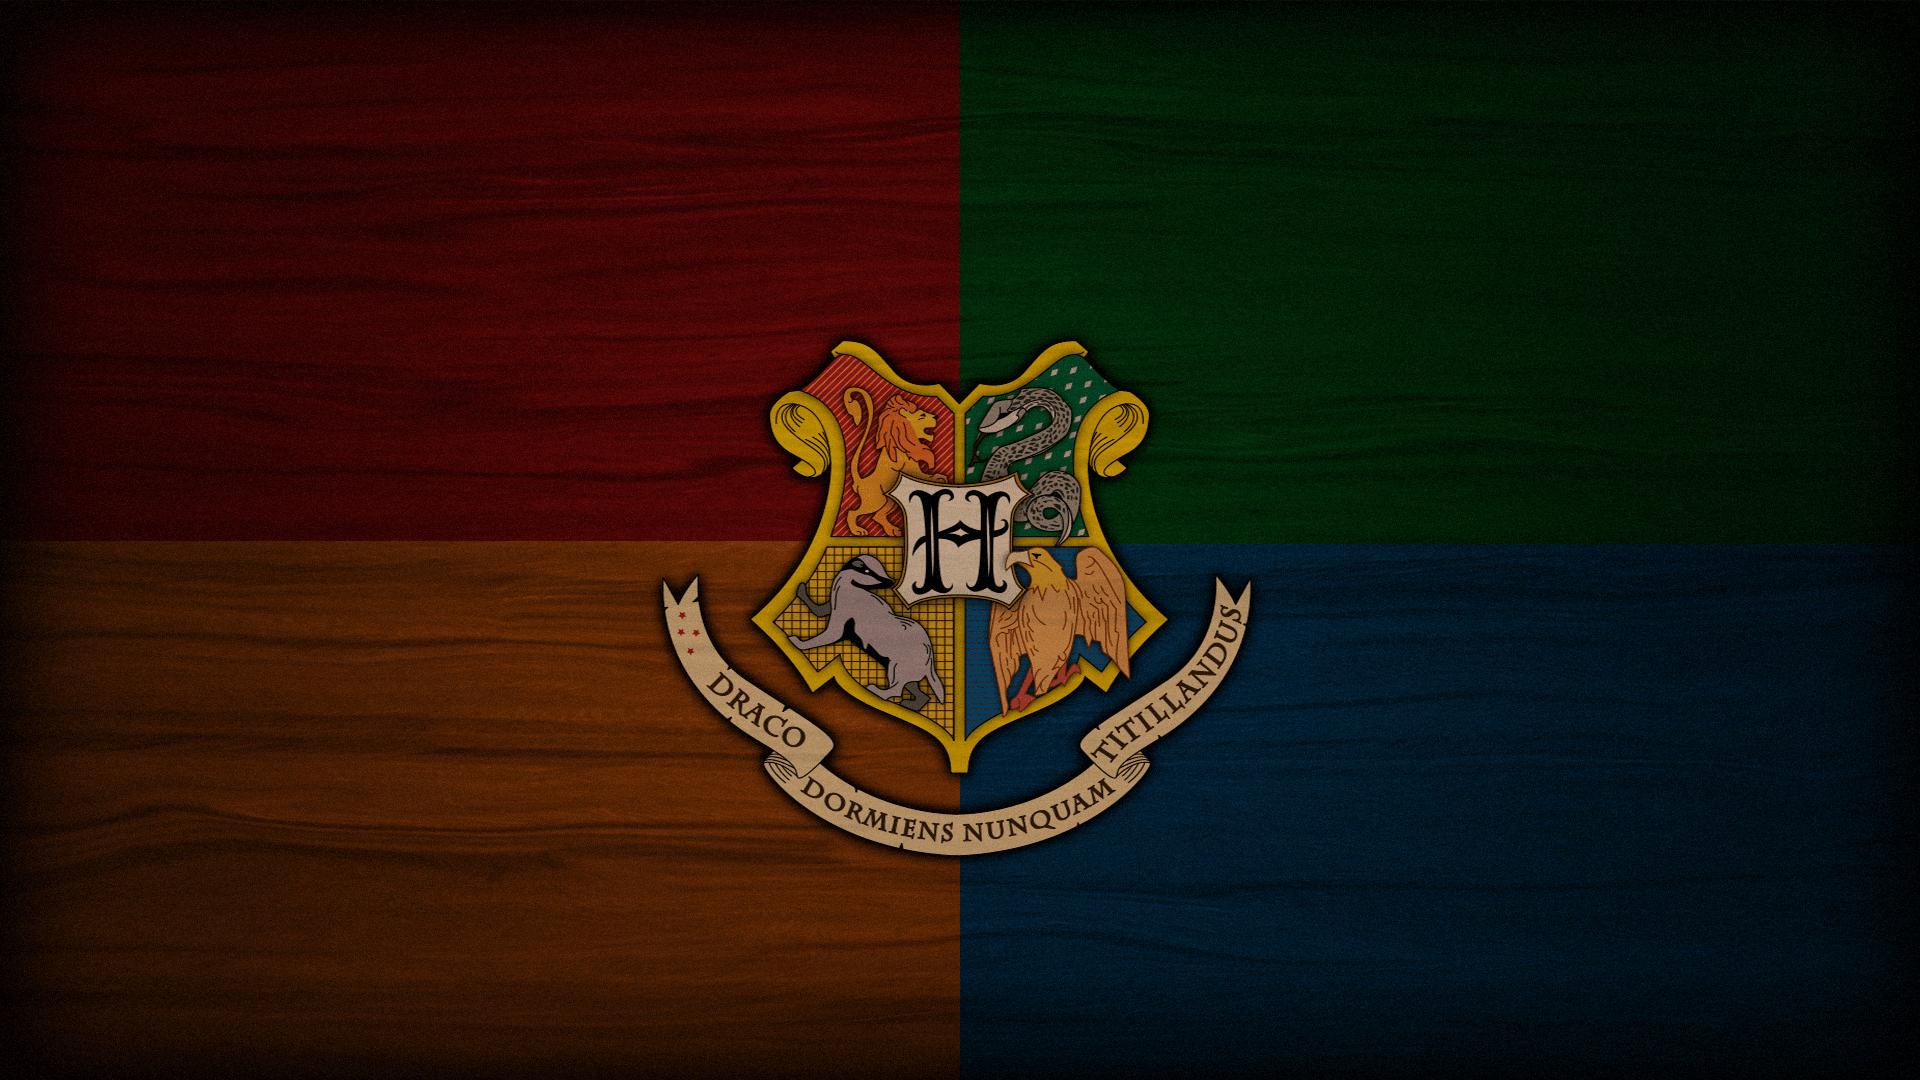 Minimalist Harry Potter Laptop Wallpapers - Top Free ...